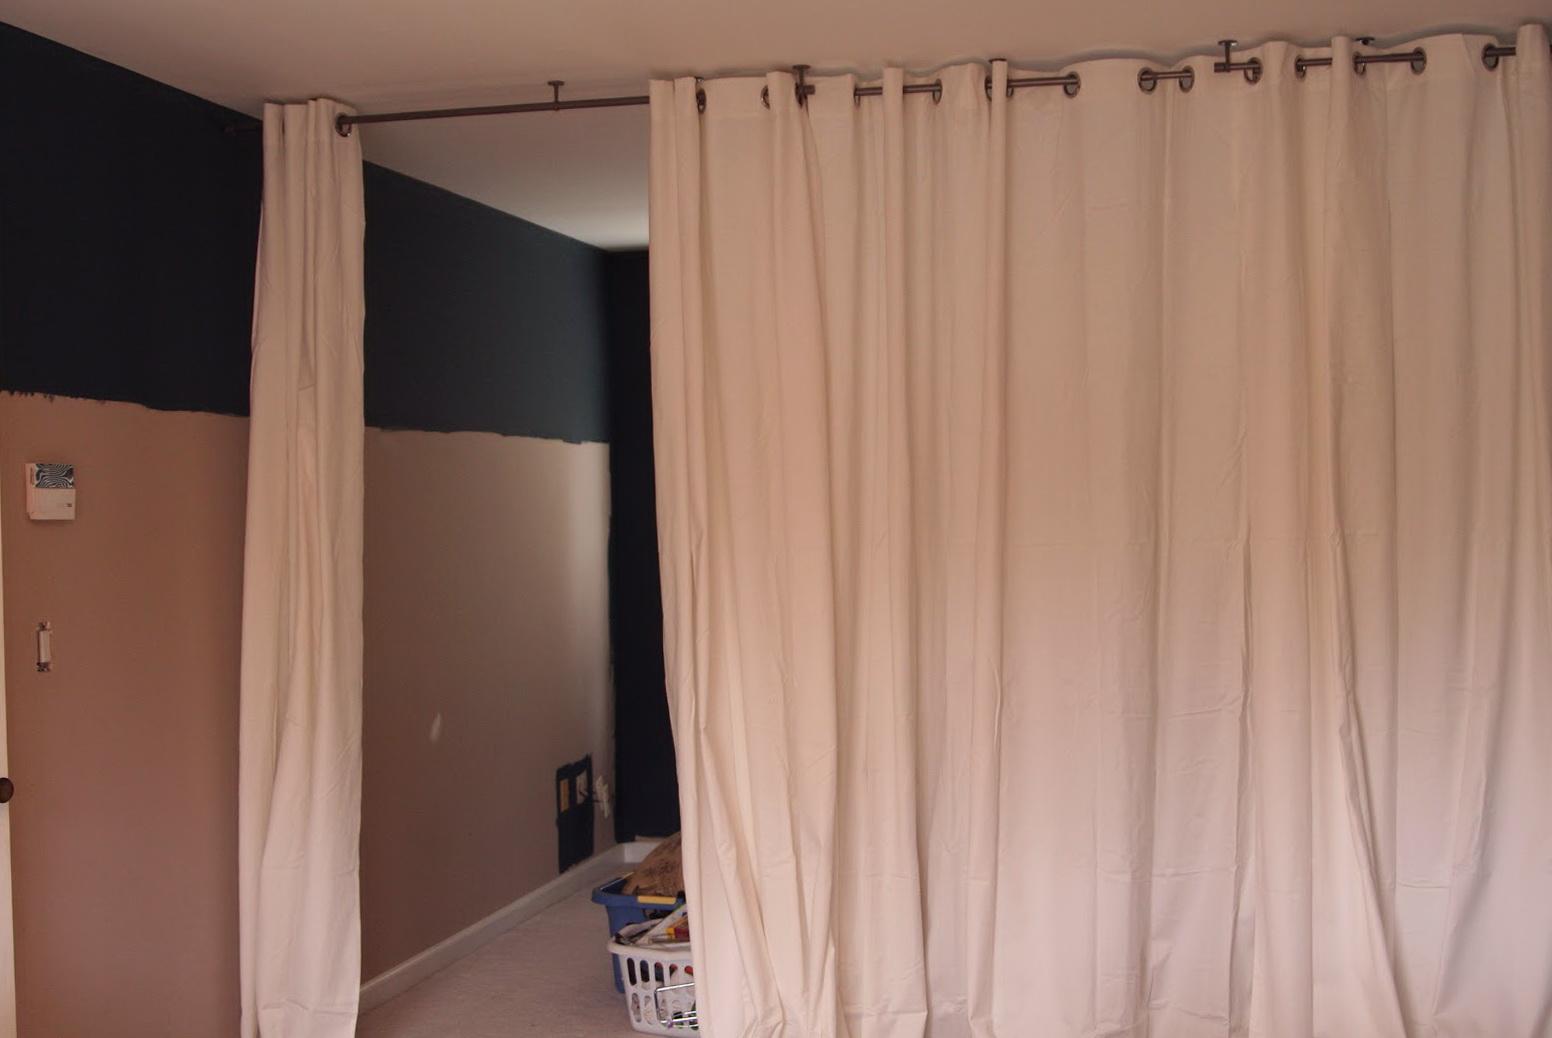 Delicieux Diy Room Divider Curtains